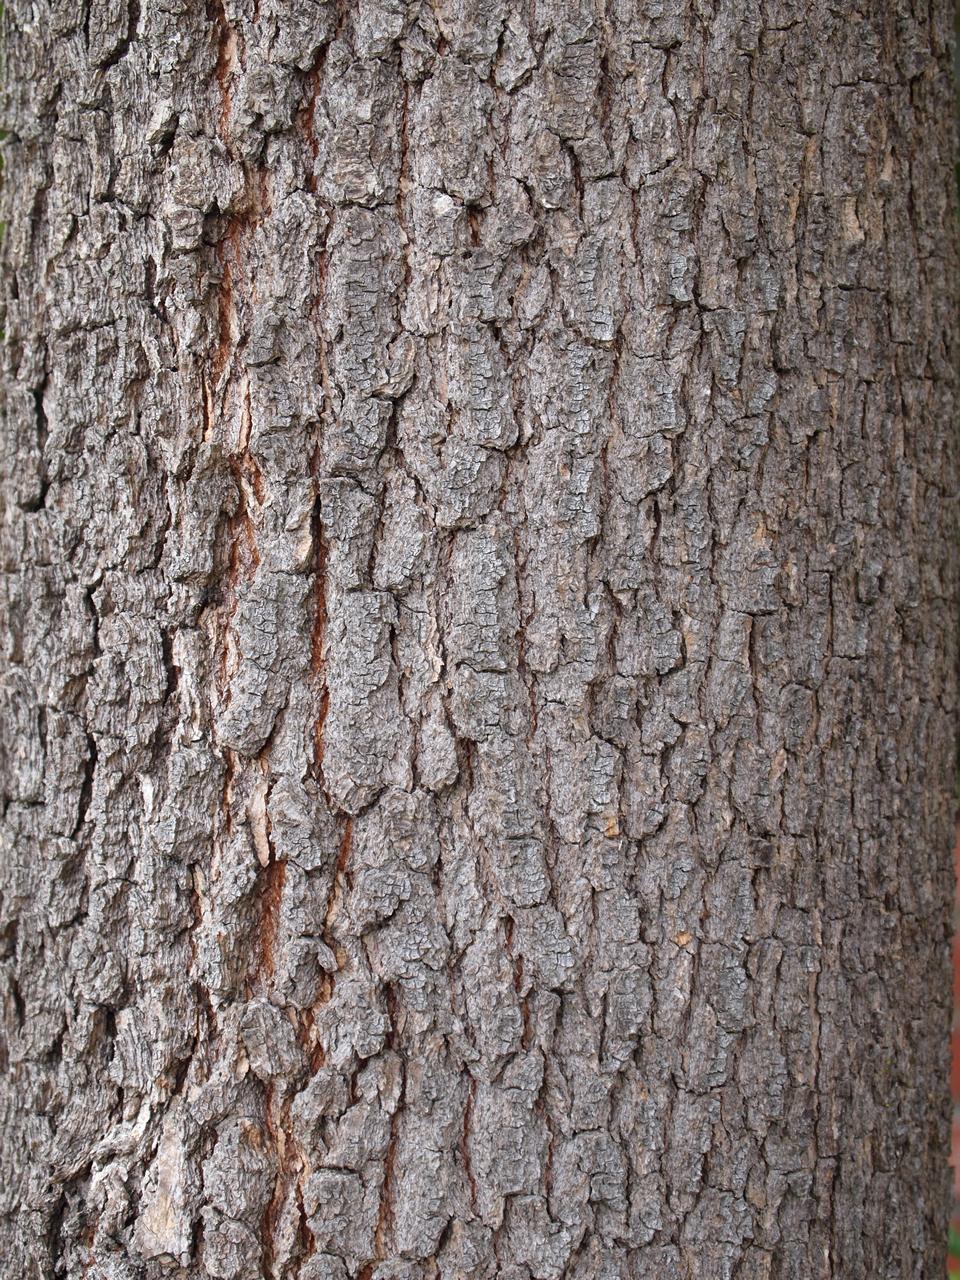 Camphor-bark